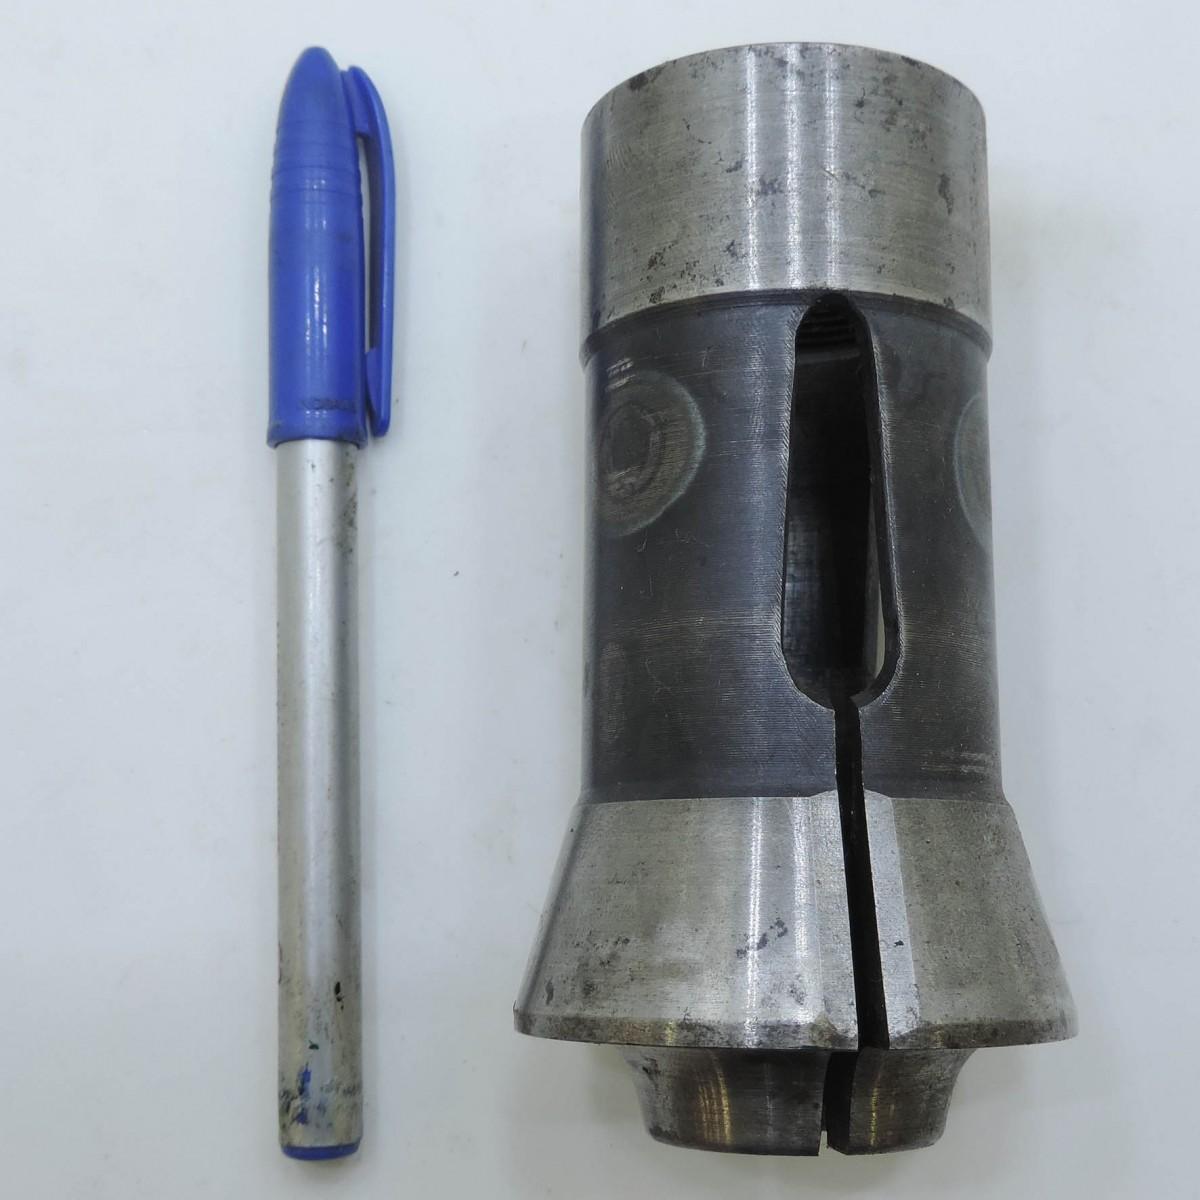 Pinça Sextavada Para Torno Revolver Ama/xervitt 15 Mm -Sc336